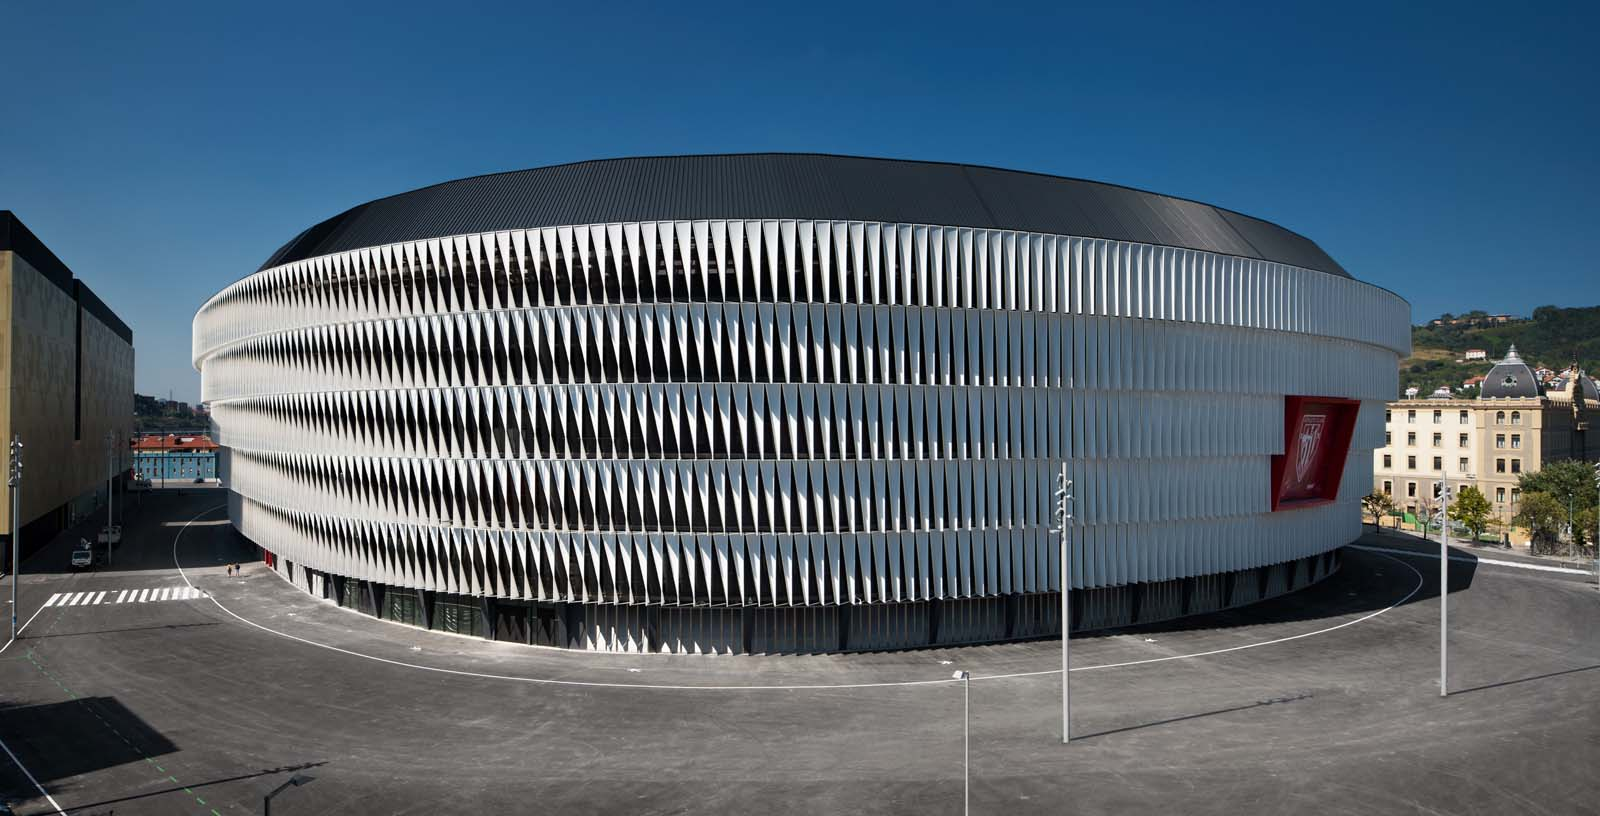 San_Mames_Stadium_01_Architecture_IDOM_photo_Aitor_Ortiz